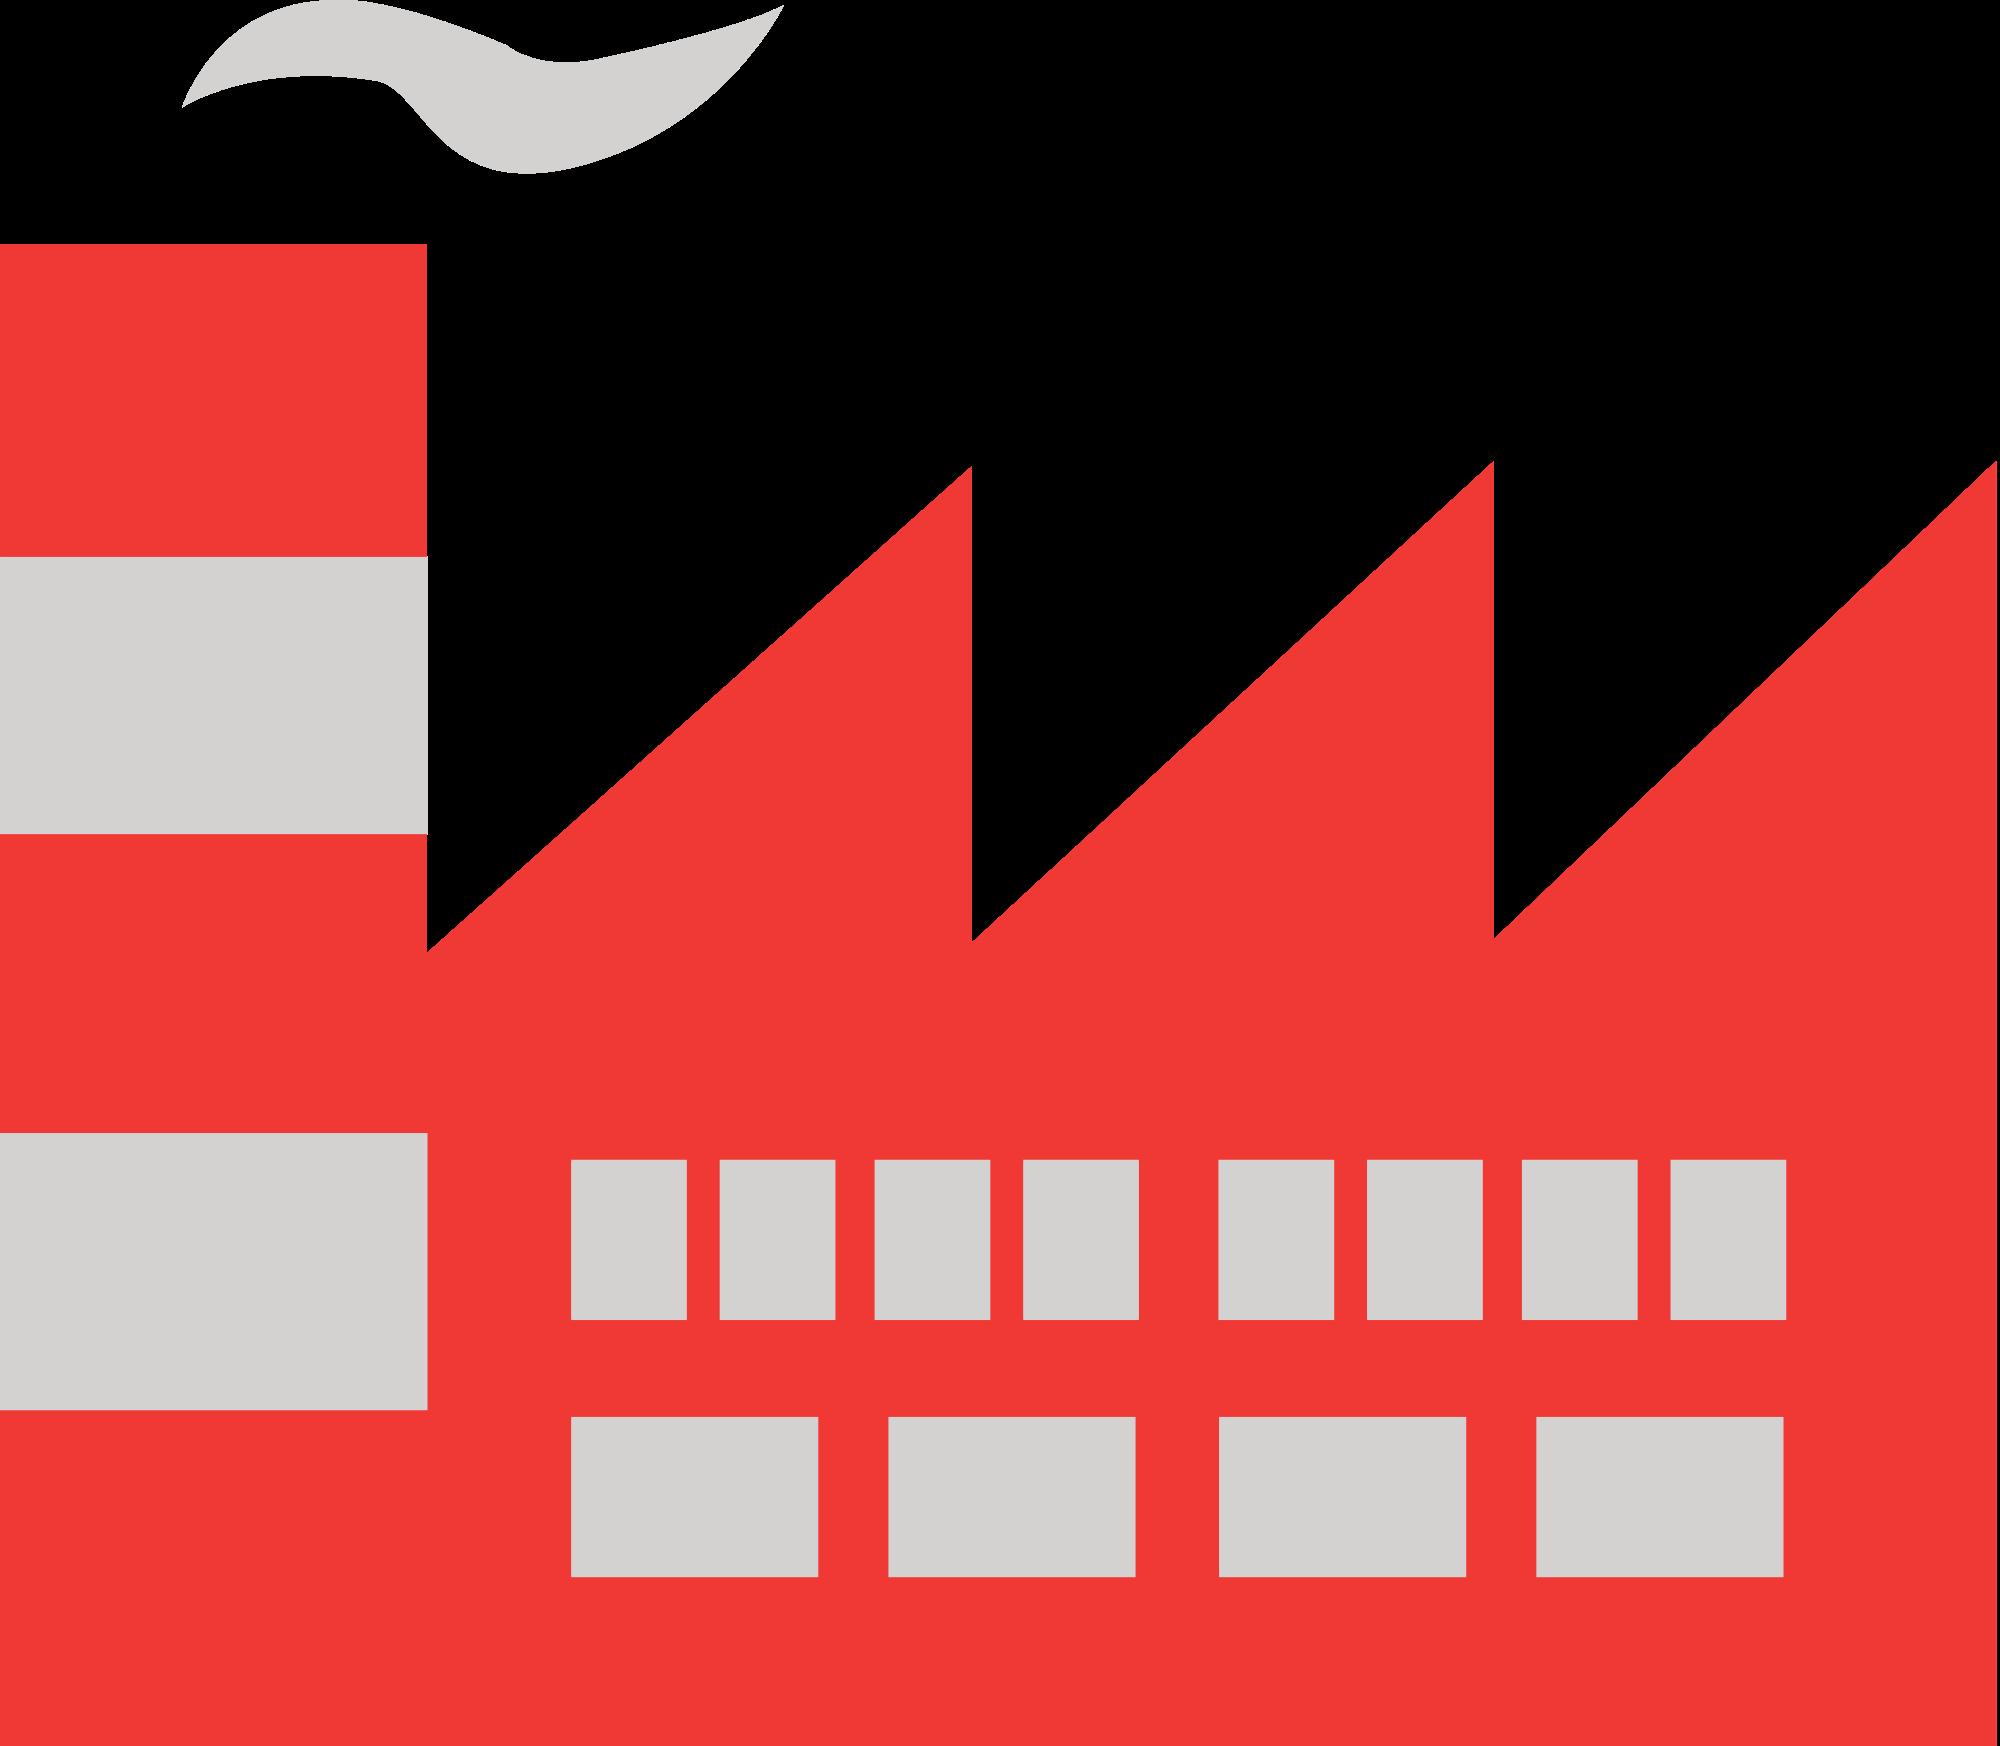 File factory svg wikimedia. Factories clipart clip art